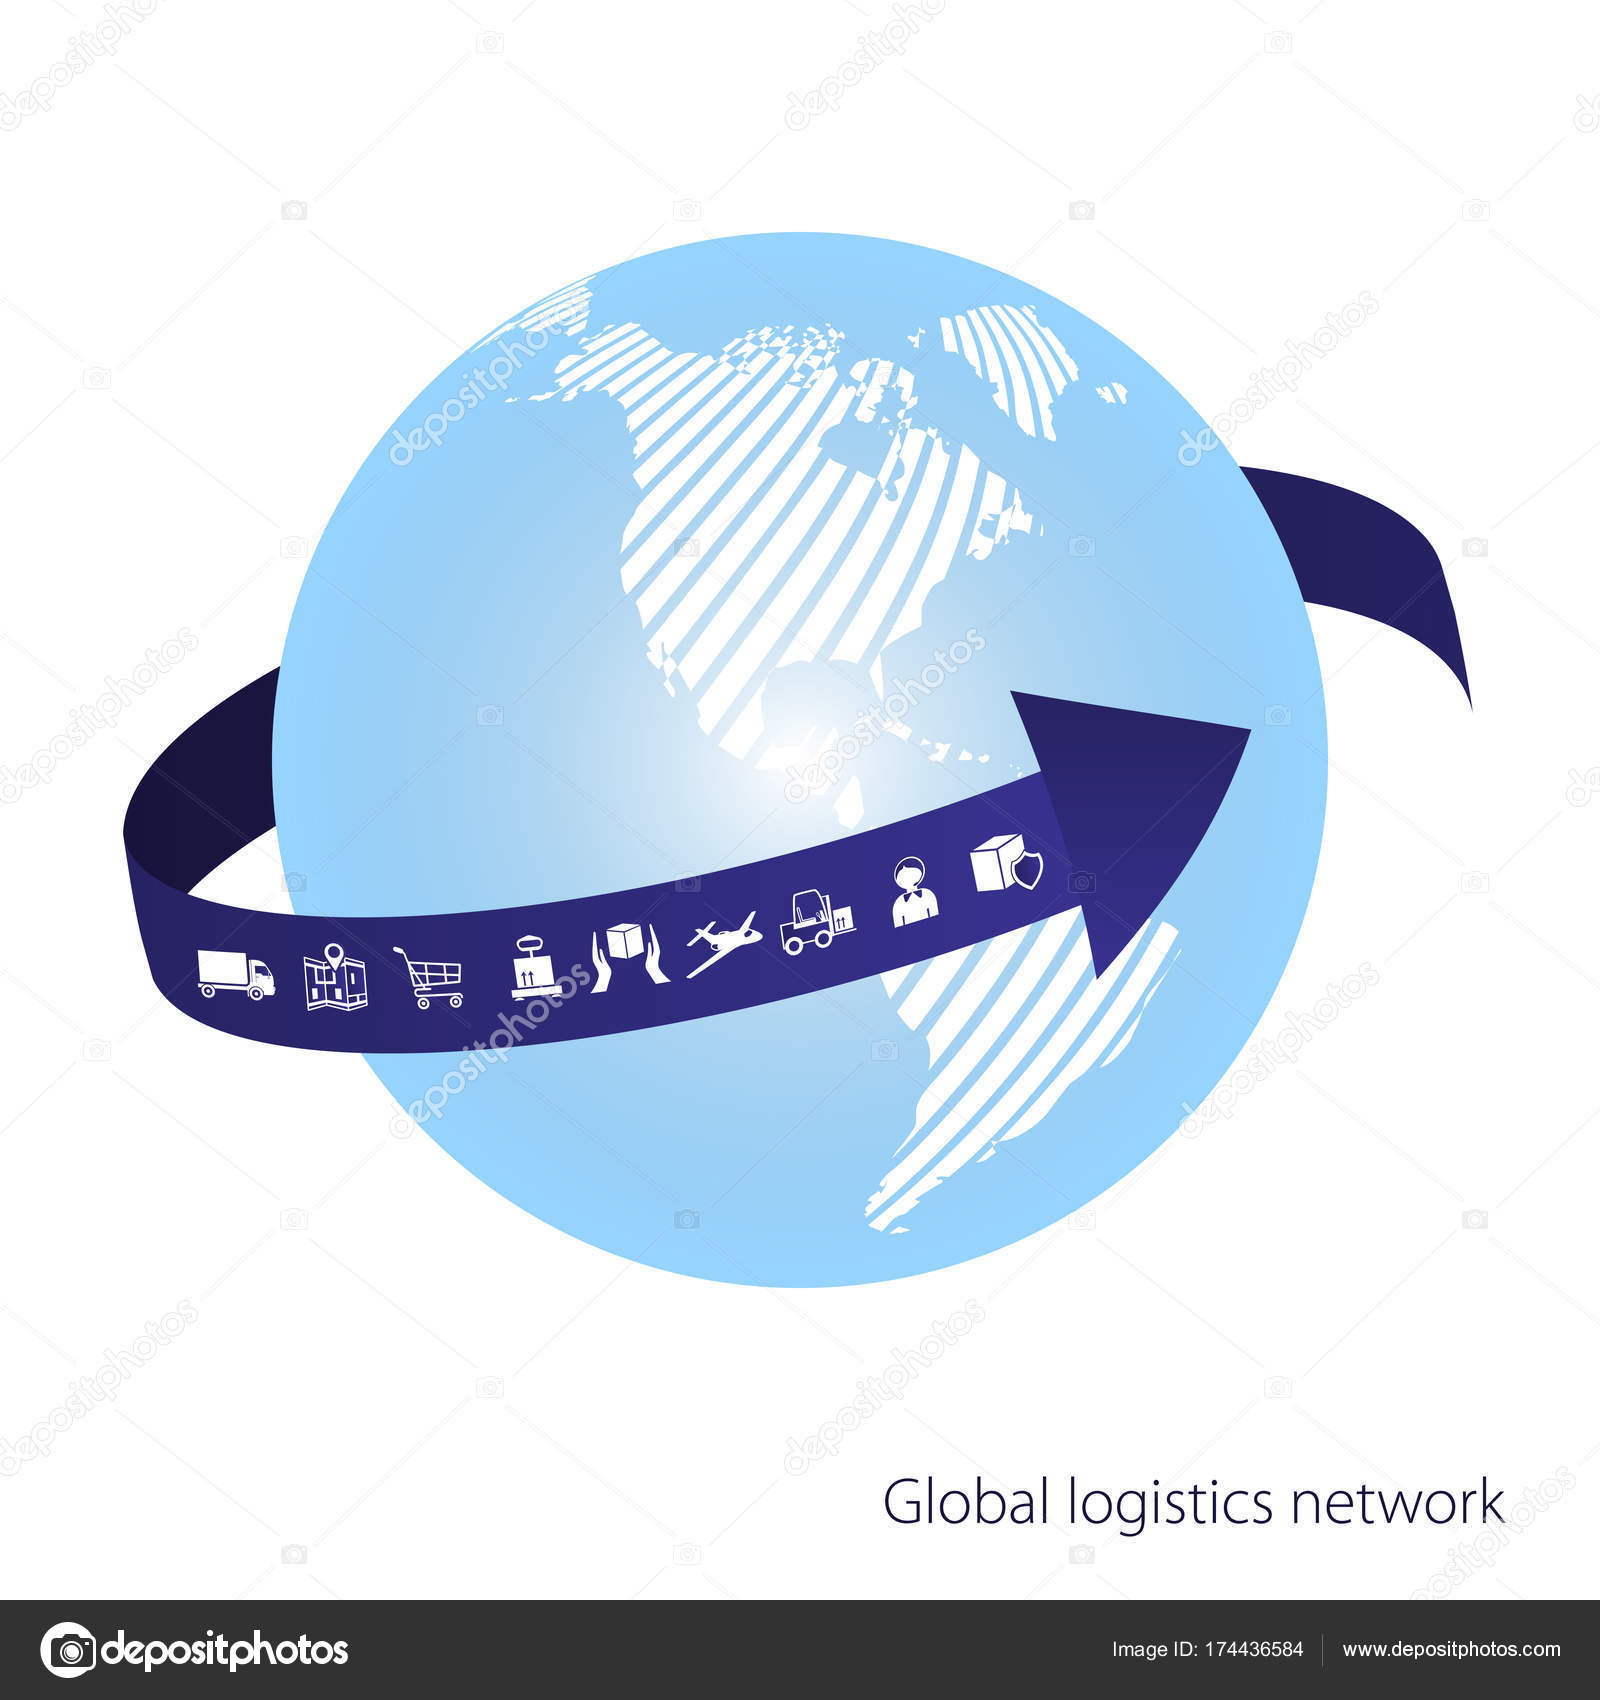 Global logistics network the blue arrow goes around the globe the blue arrow goes around the globe white similar world map set icons transport and logistics flat design vector illustration eps10 gumiabroncs Images